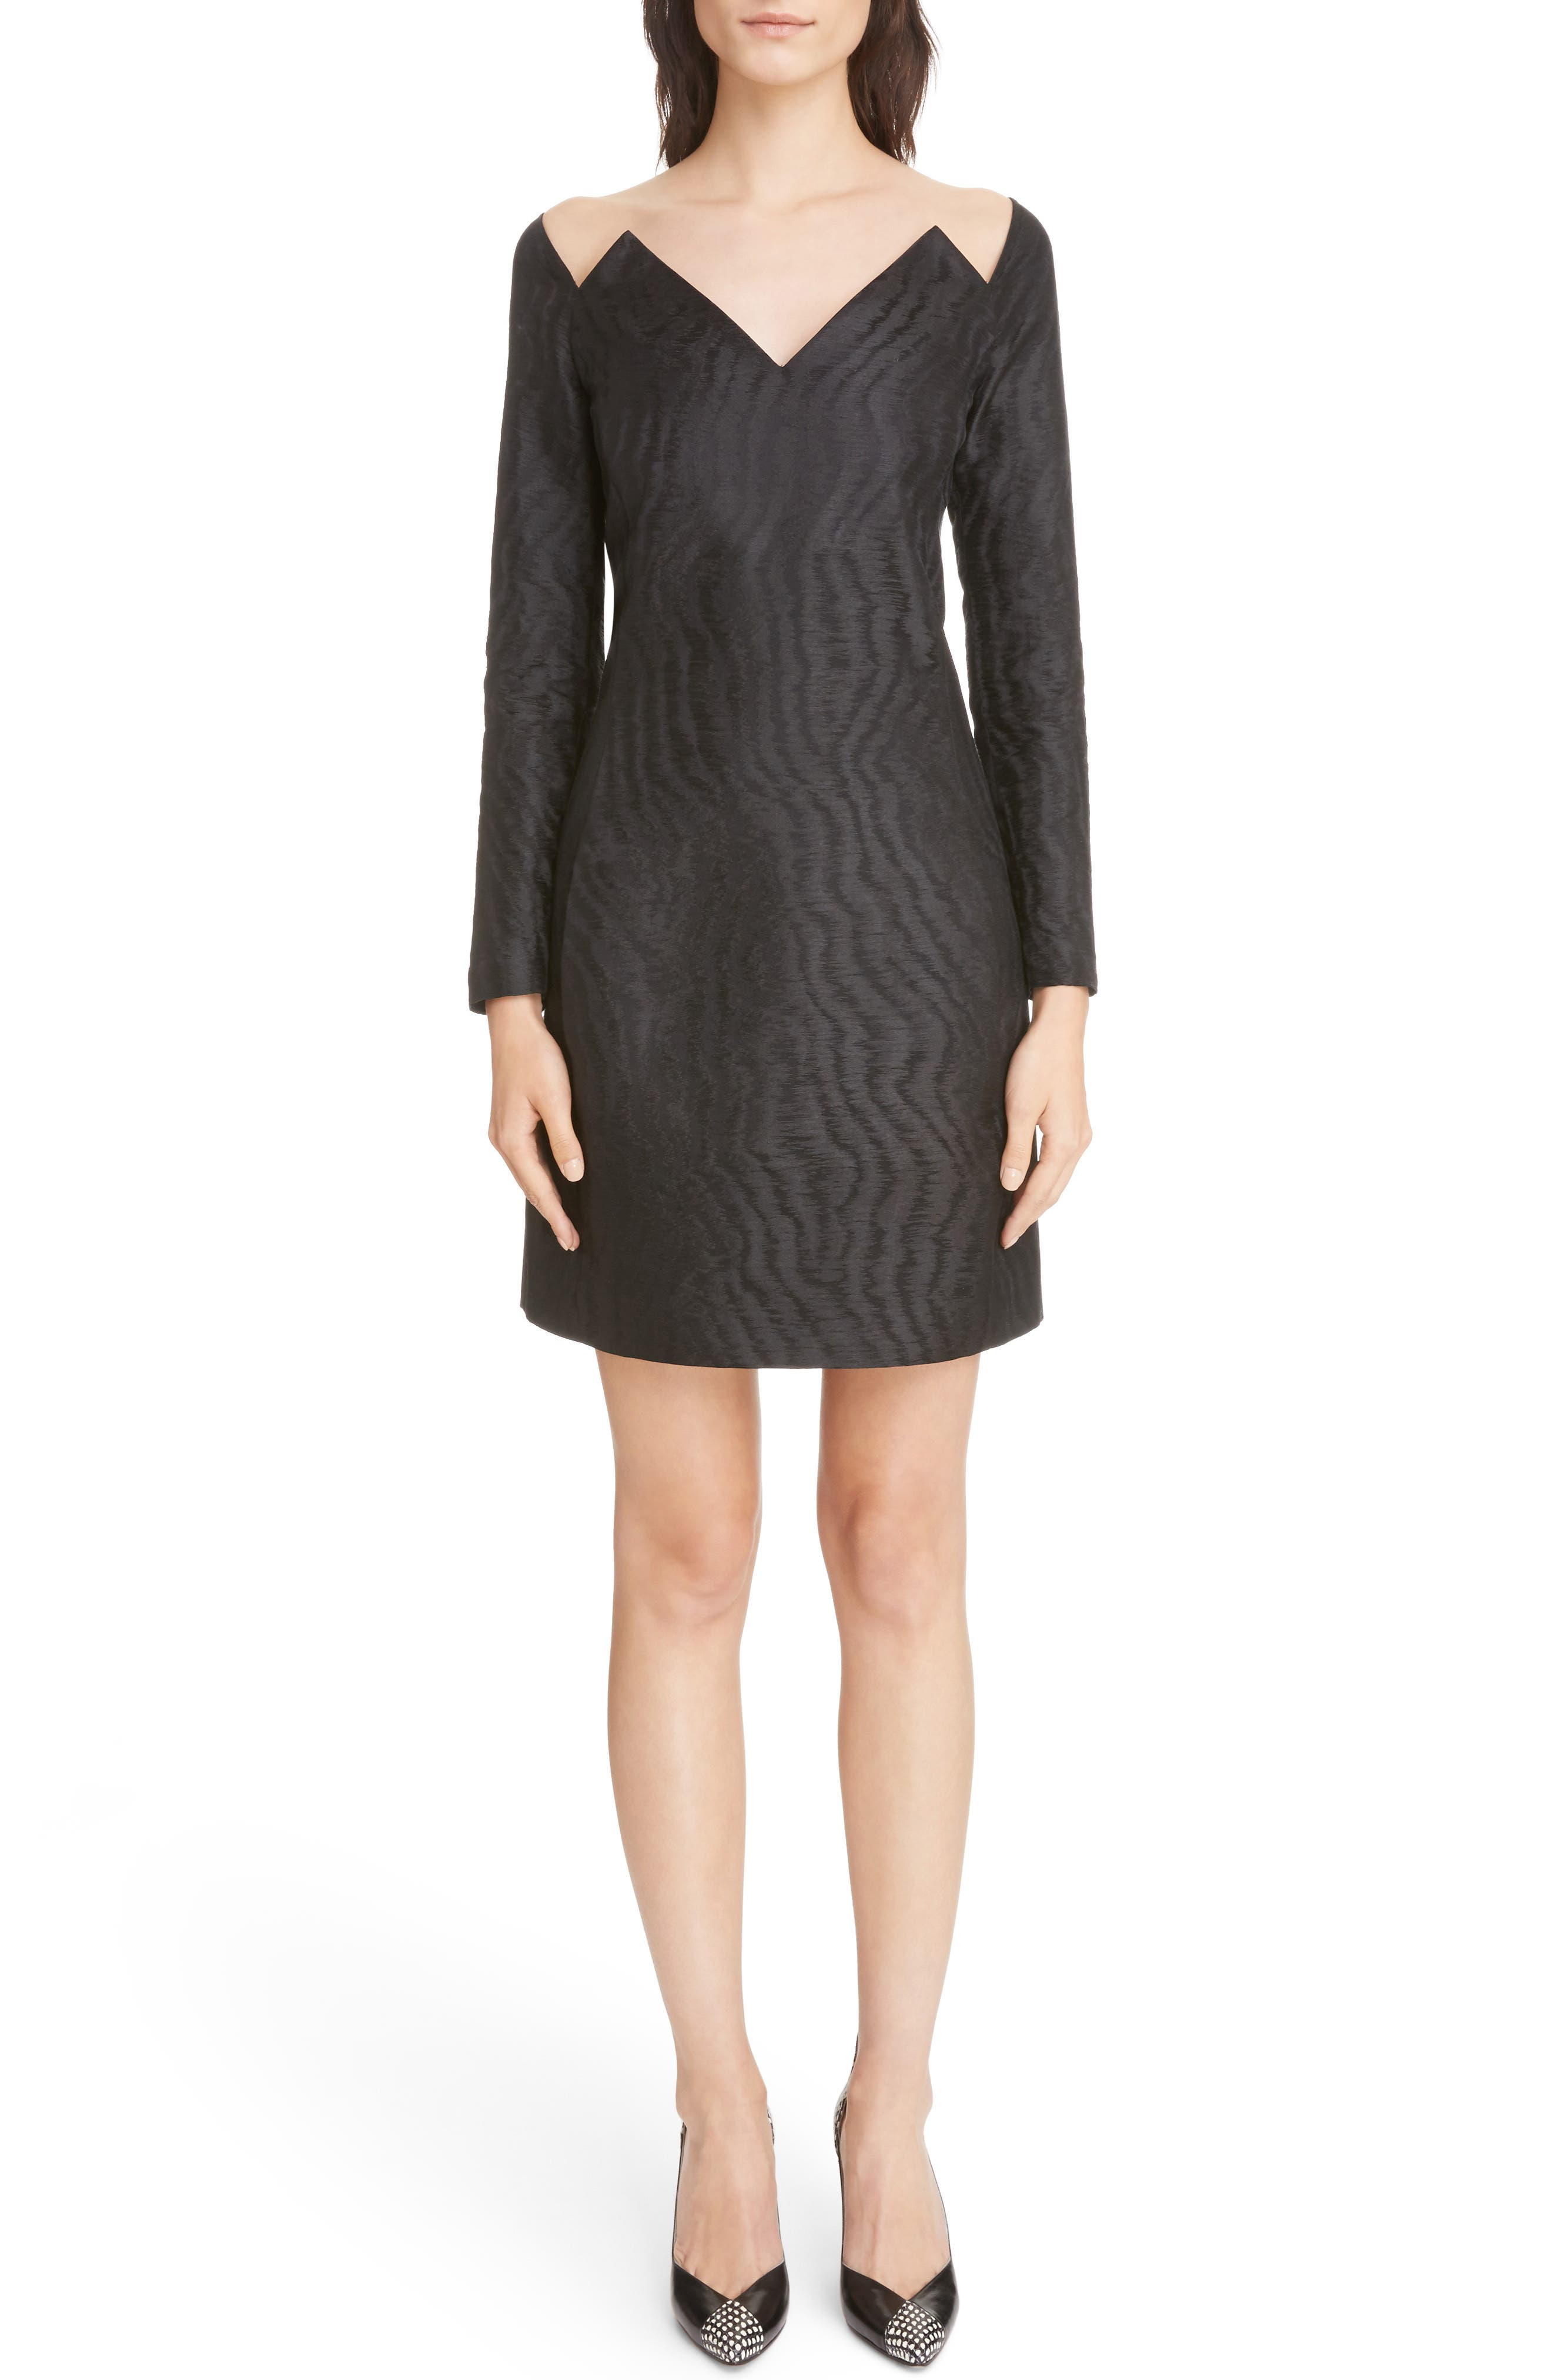 Givenchy Moiré Lightning Neckline Dress